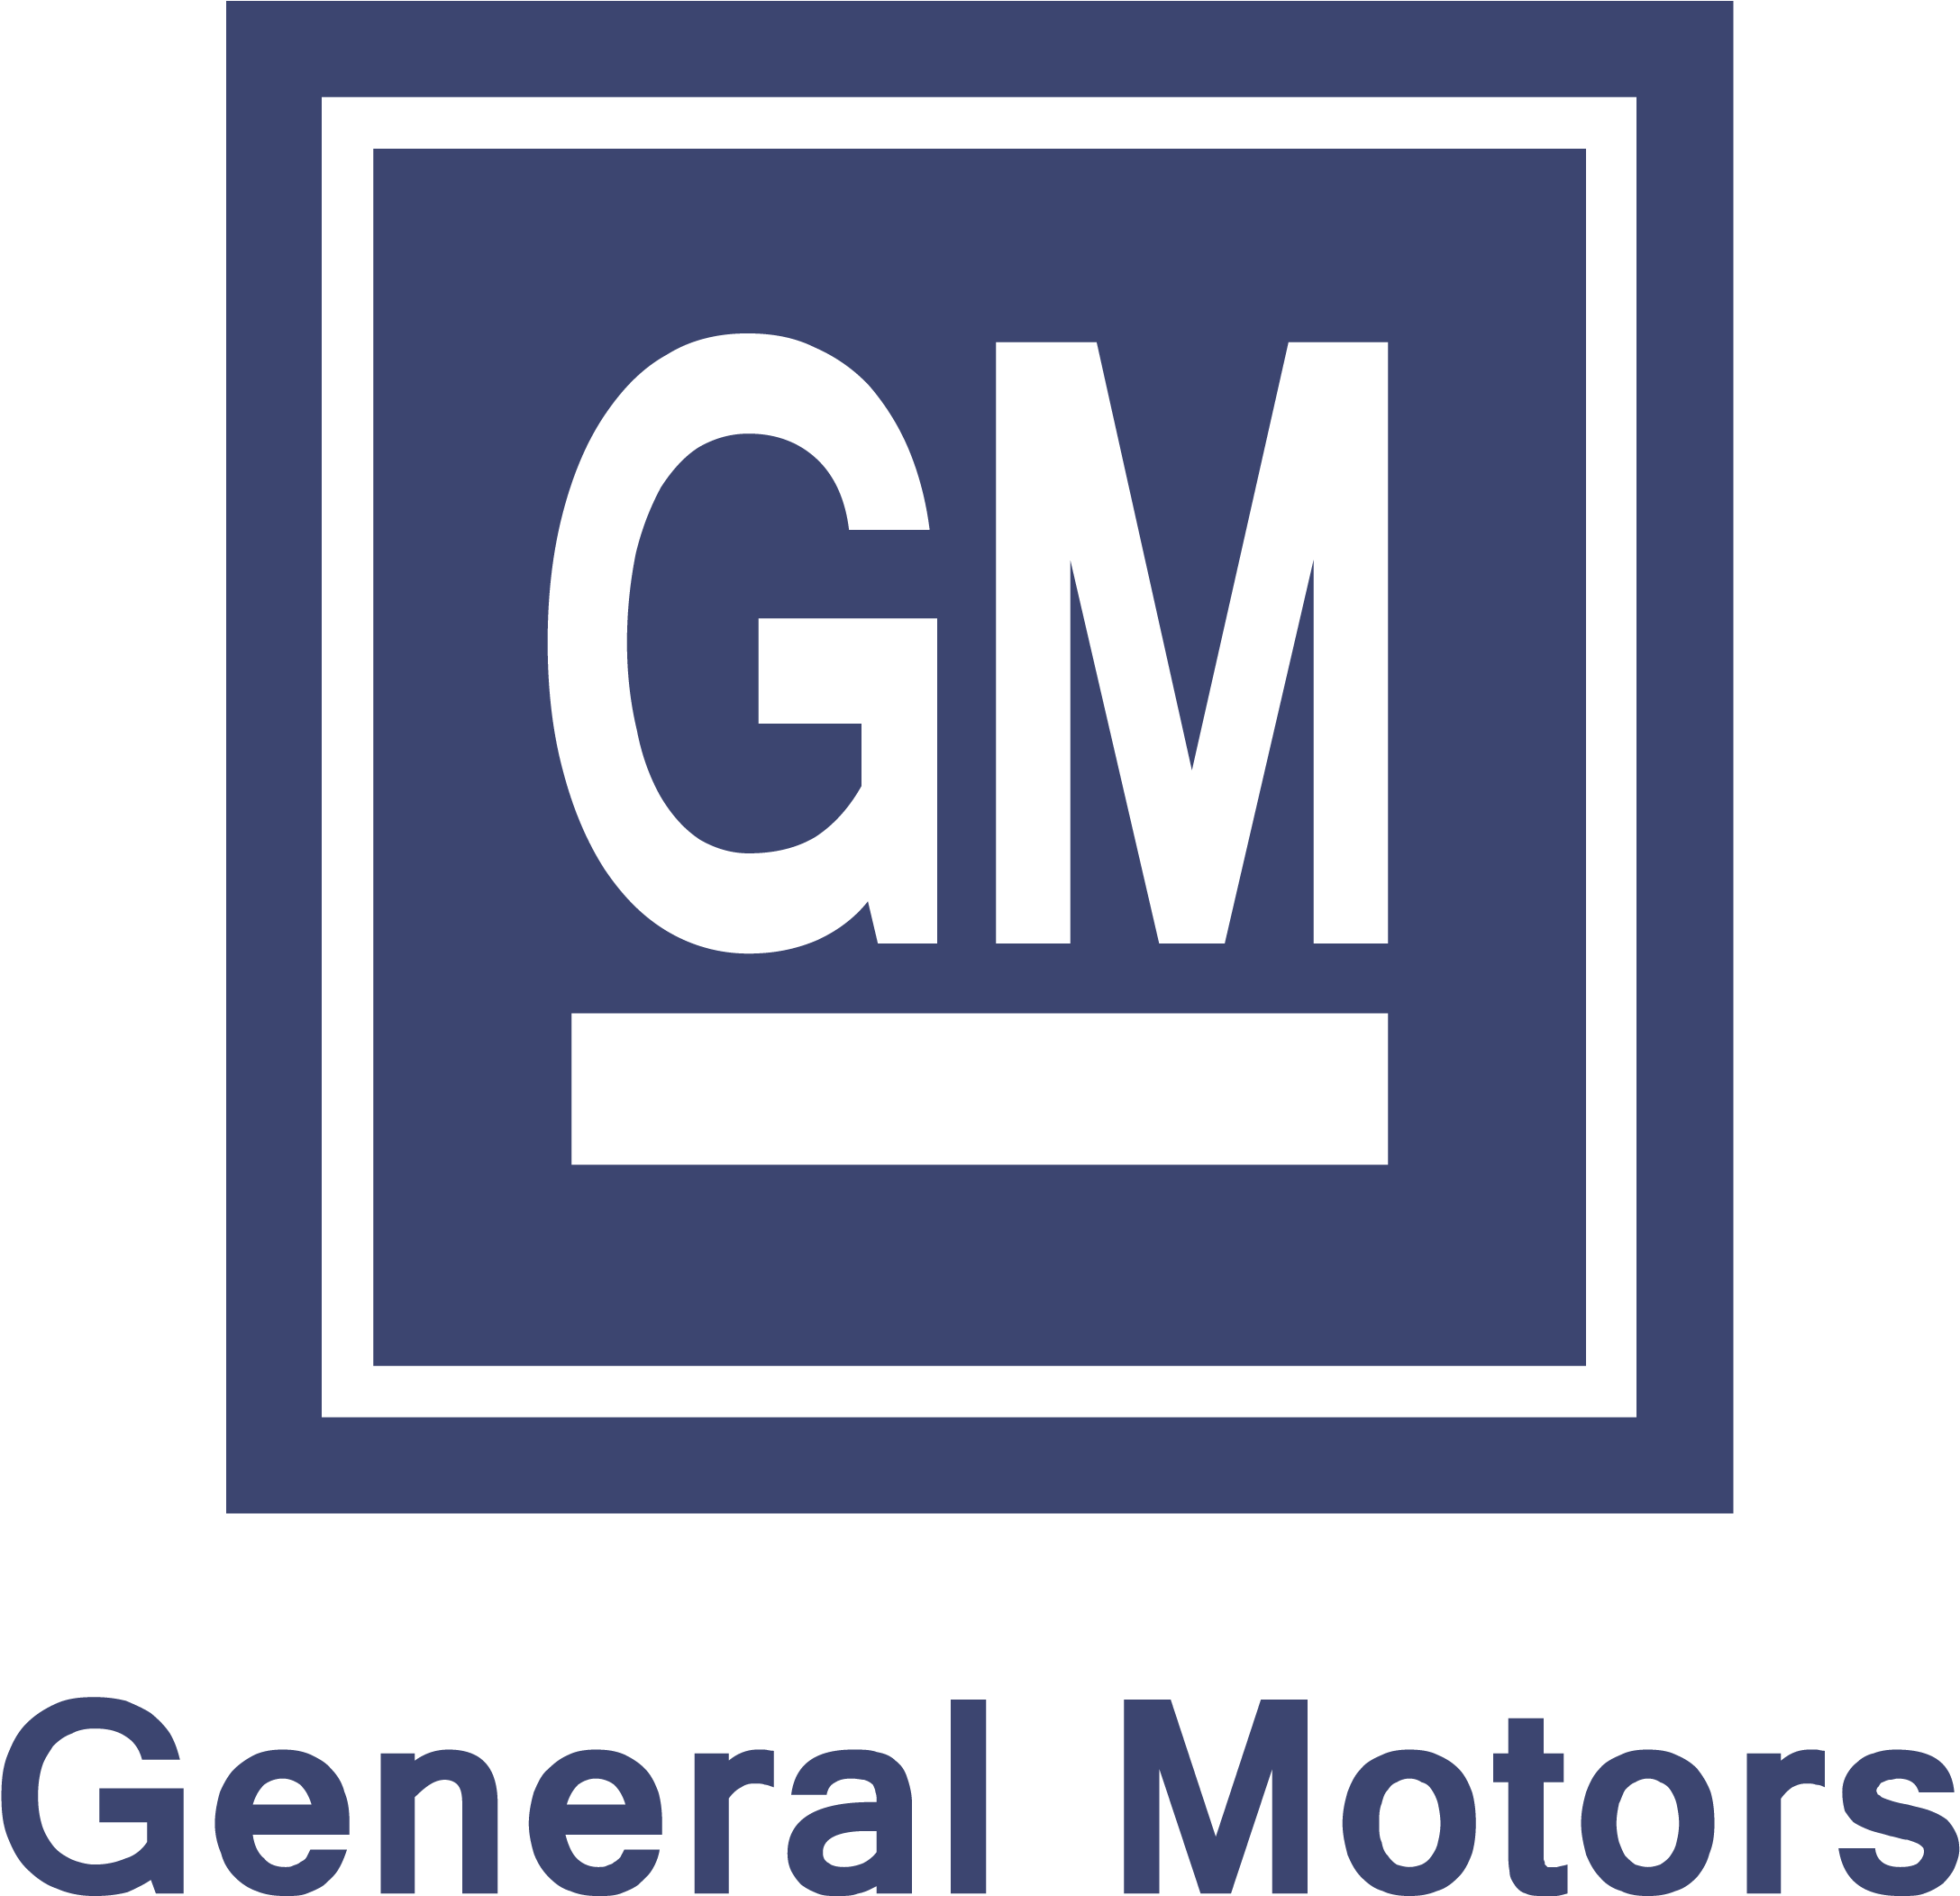 178-1785464_general-motors-logo-general-motors-zeichen-vektor-logo